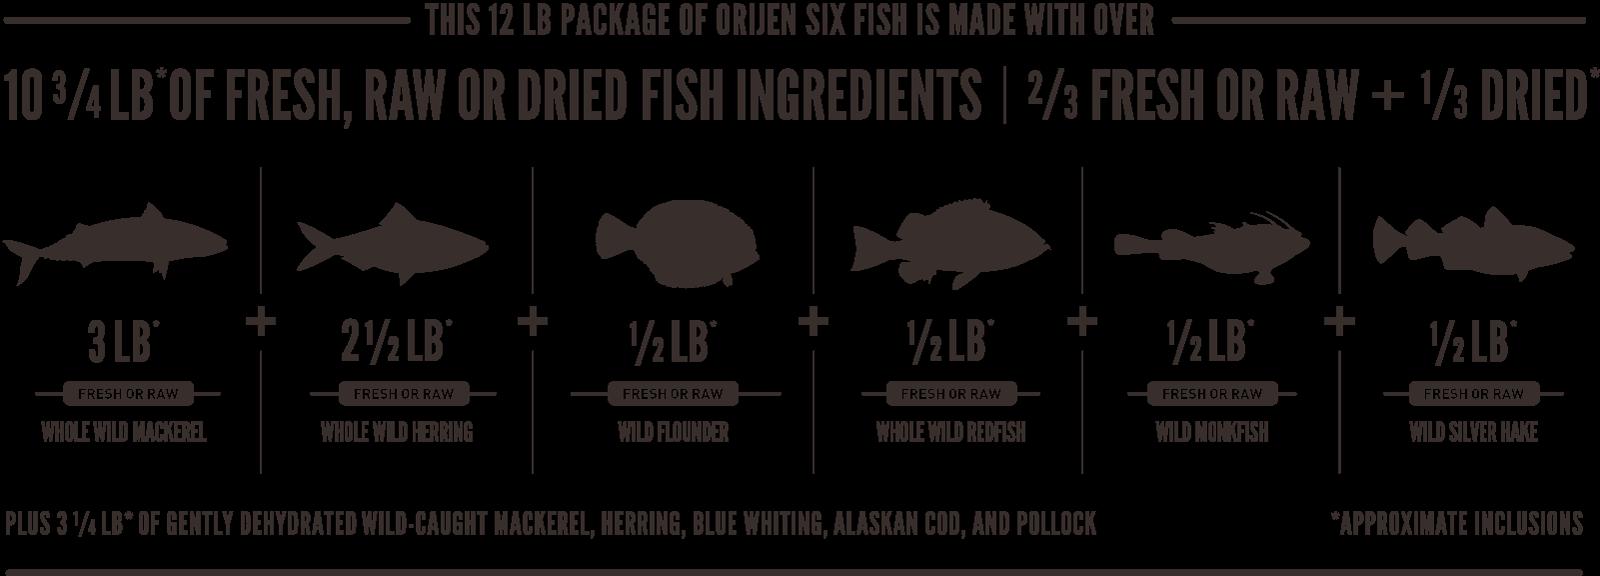 ORIJEN Six Fish Meatmath Formula and Cat Food Ingredients